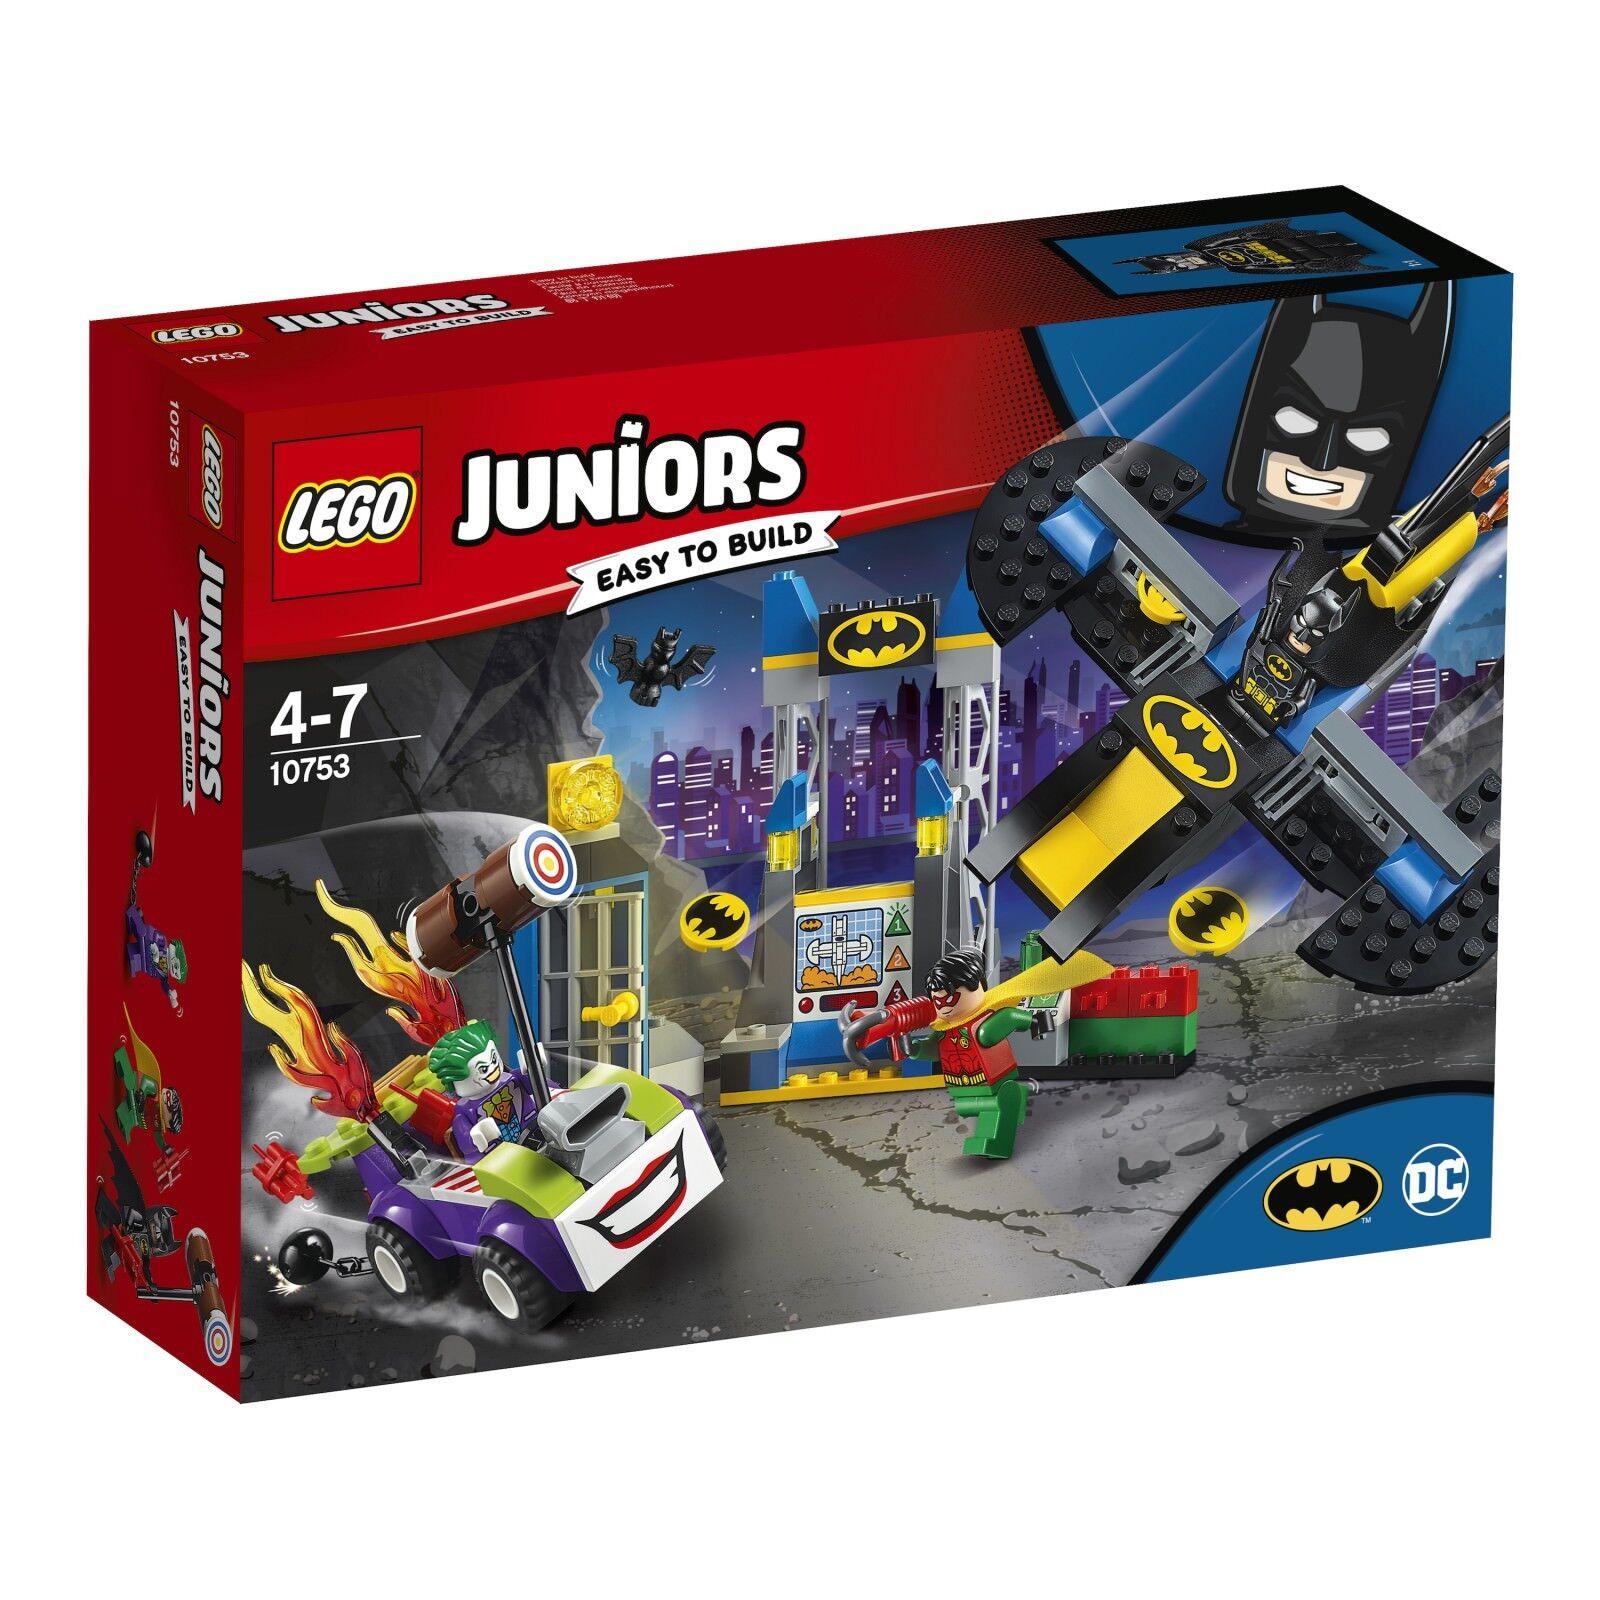 LEGO ® Juniors 10753 il Joker ™ e la bathöhle NUOVO OVP _ NEW MISB NRFB